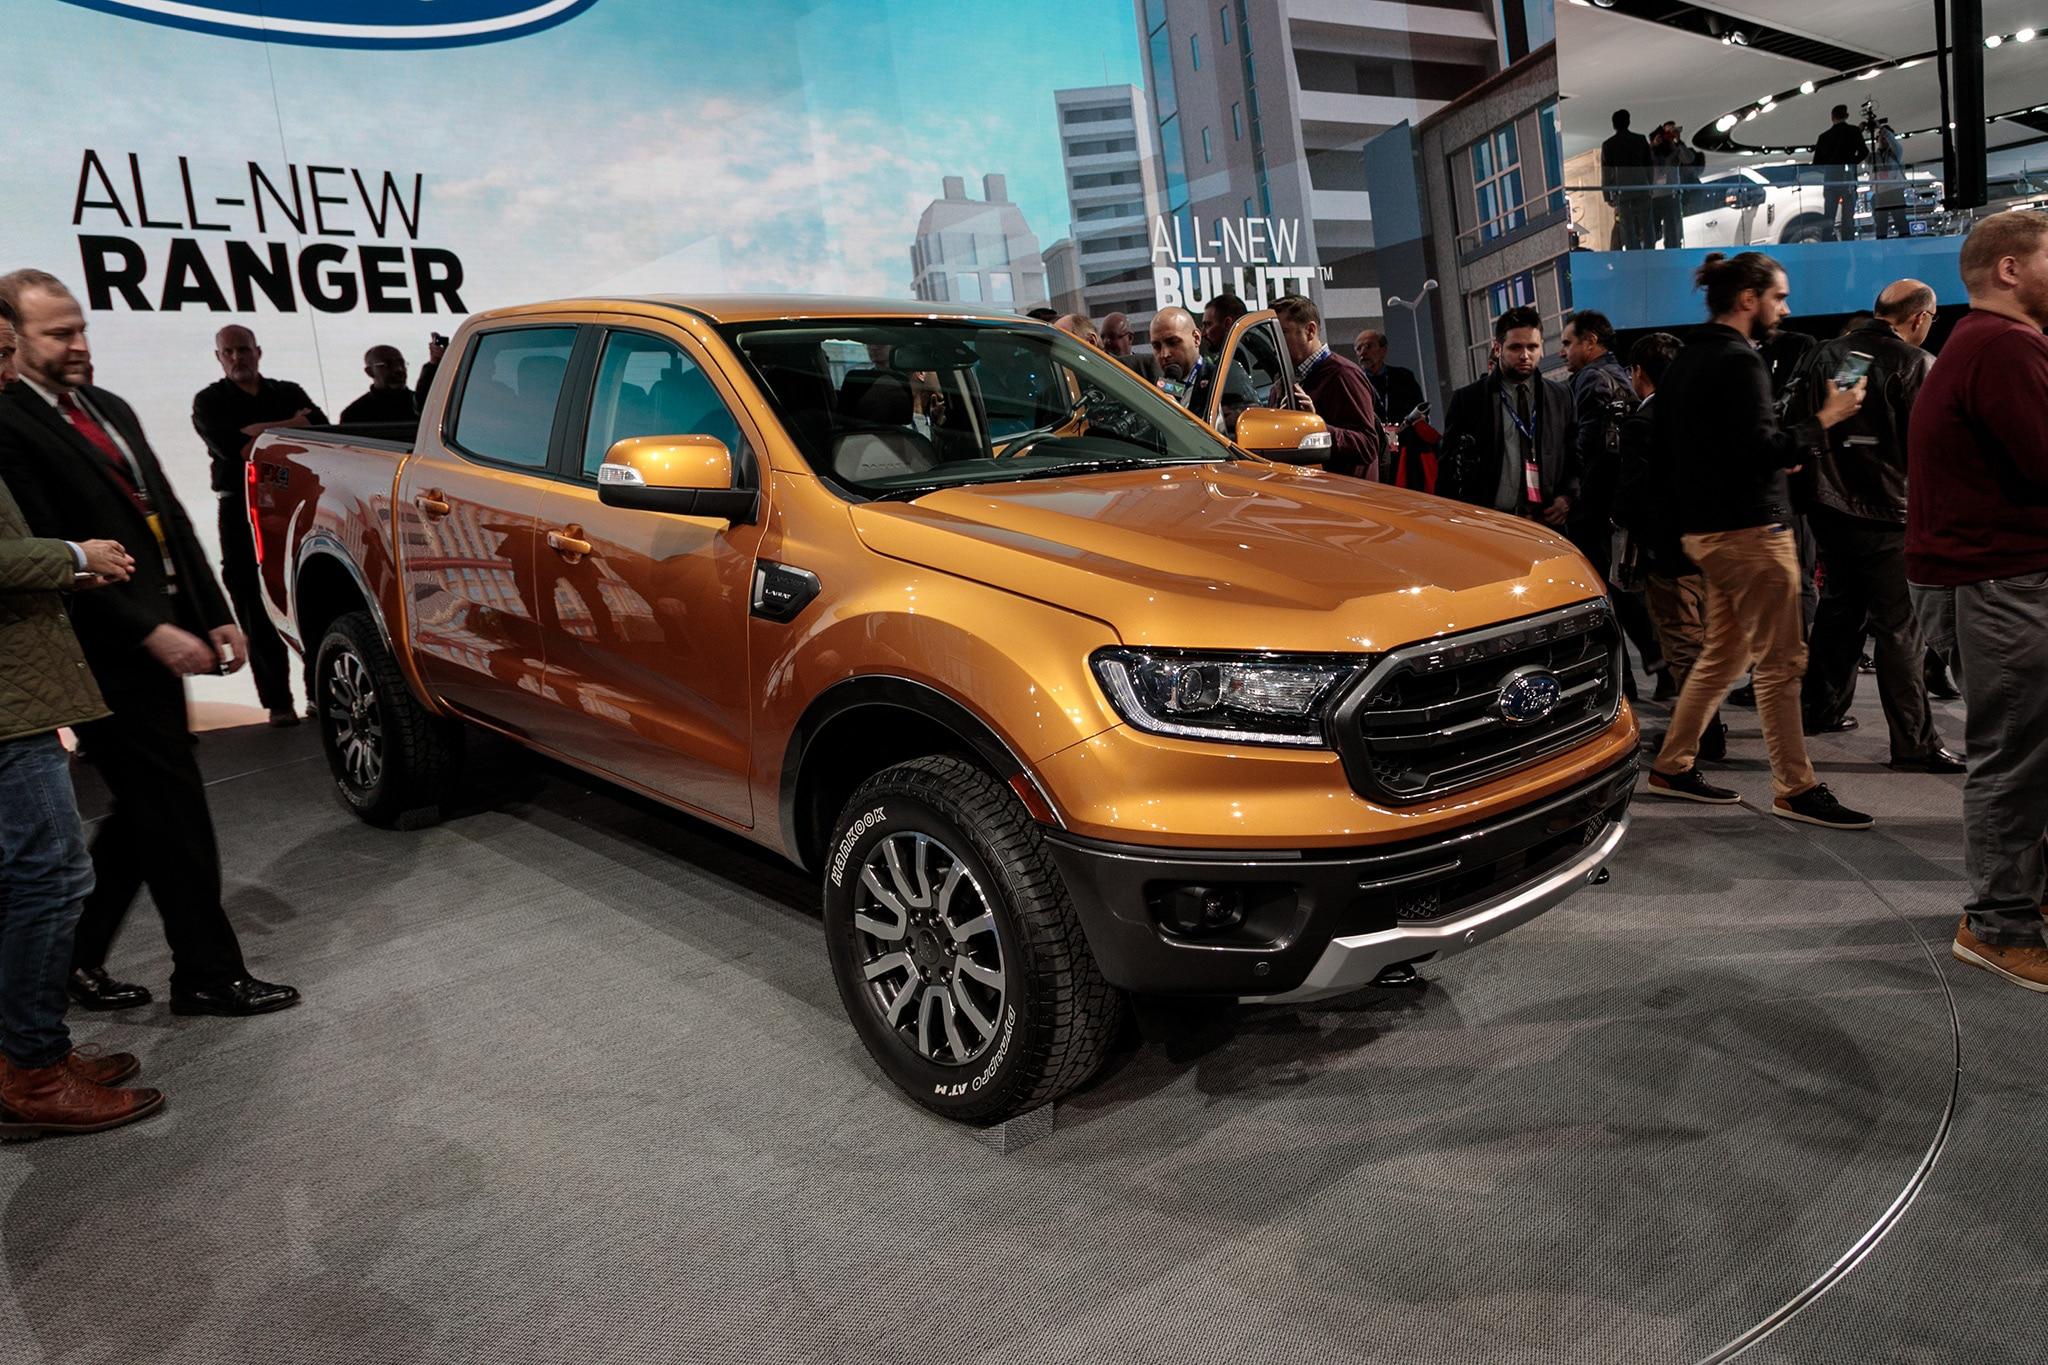 2019 Ford Ranger Lariat FX4 03 - Motor Trend en Español